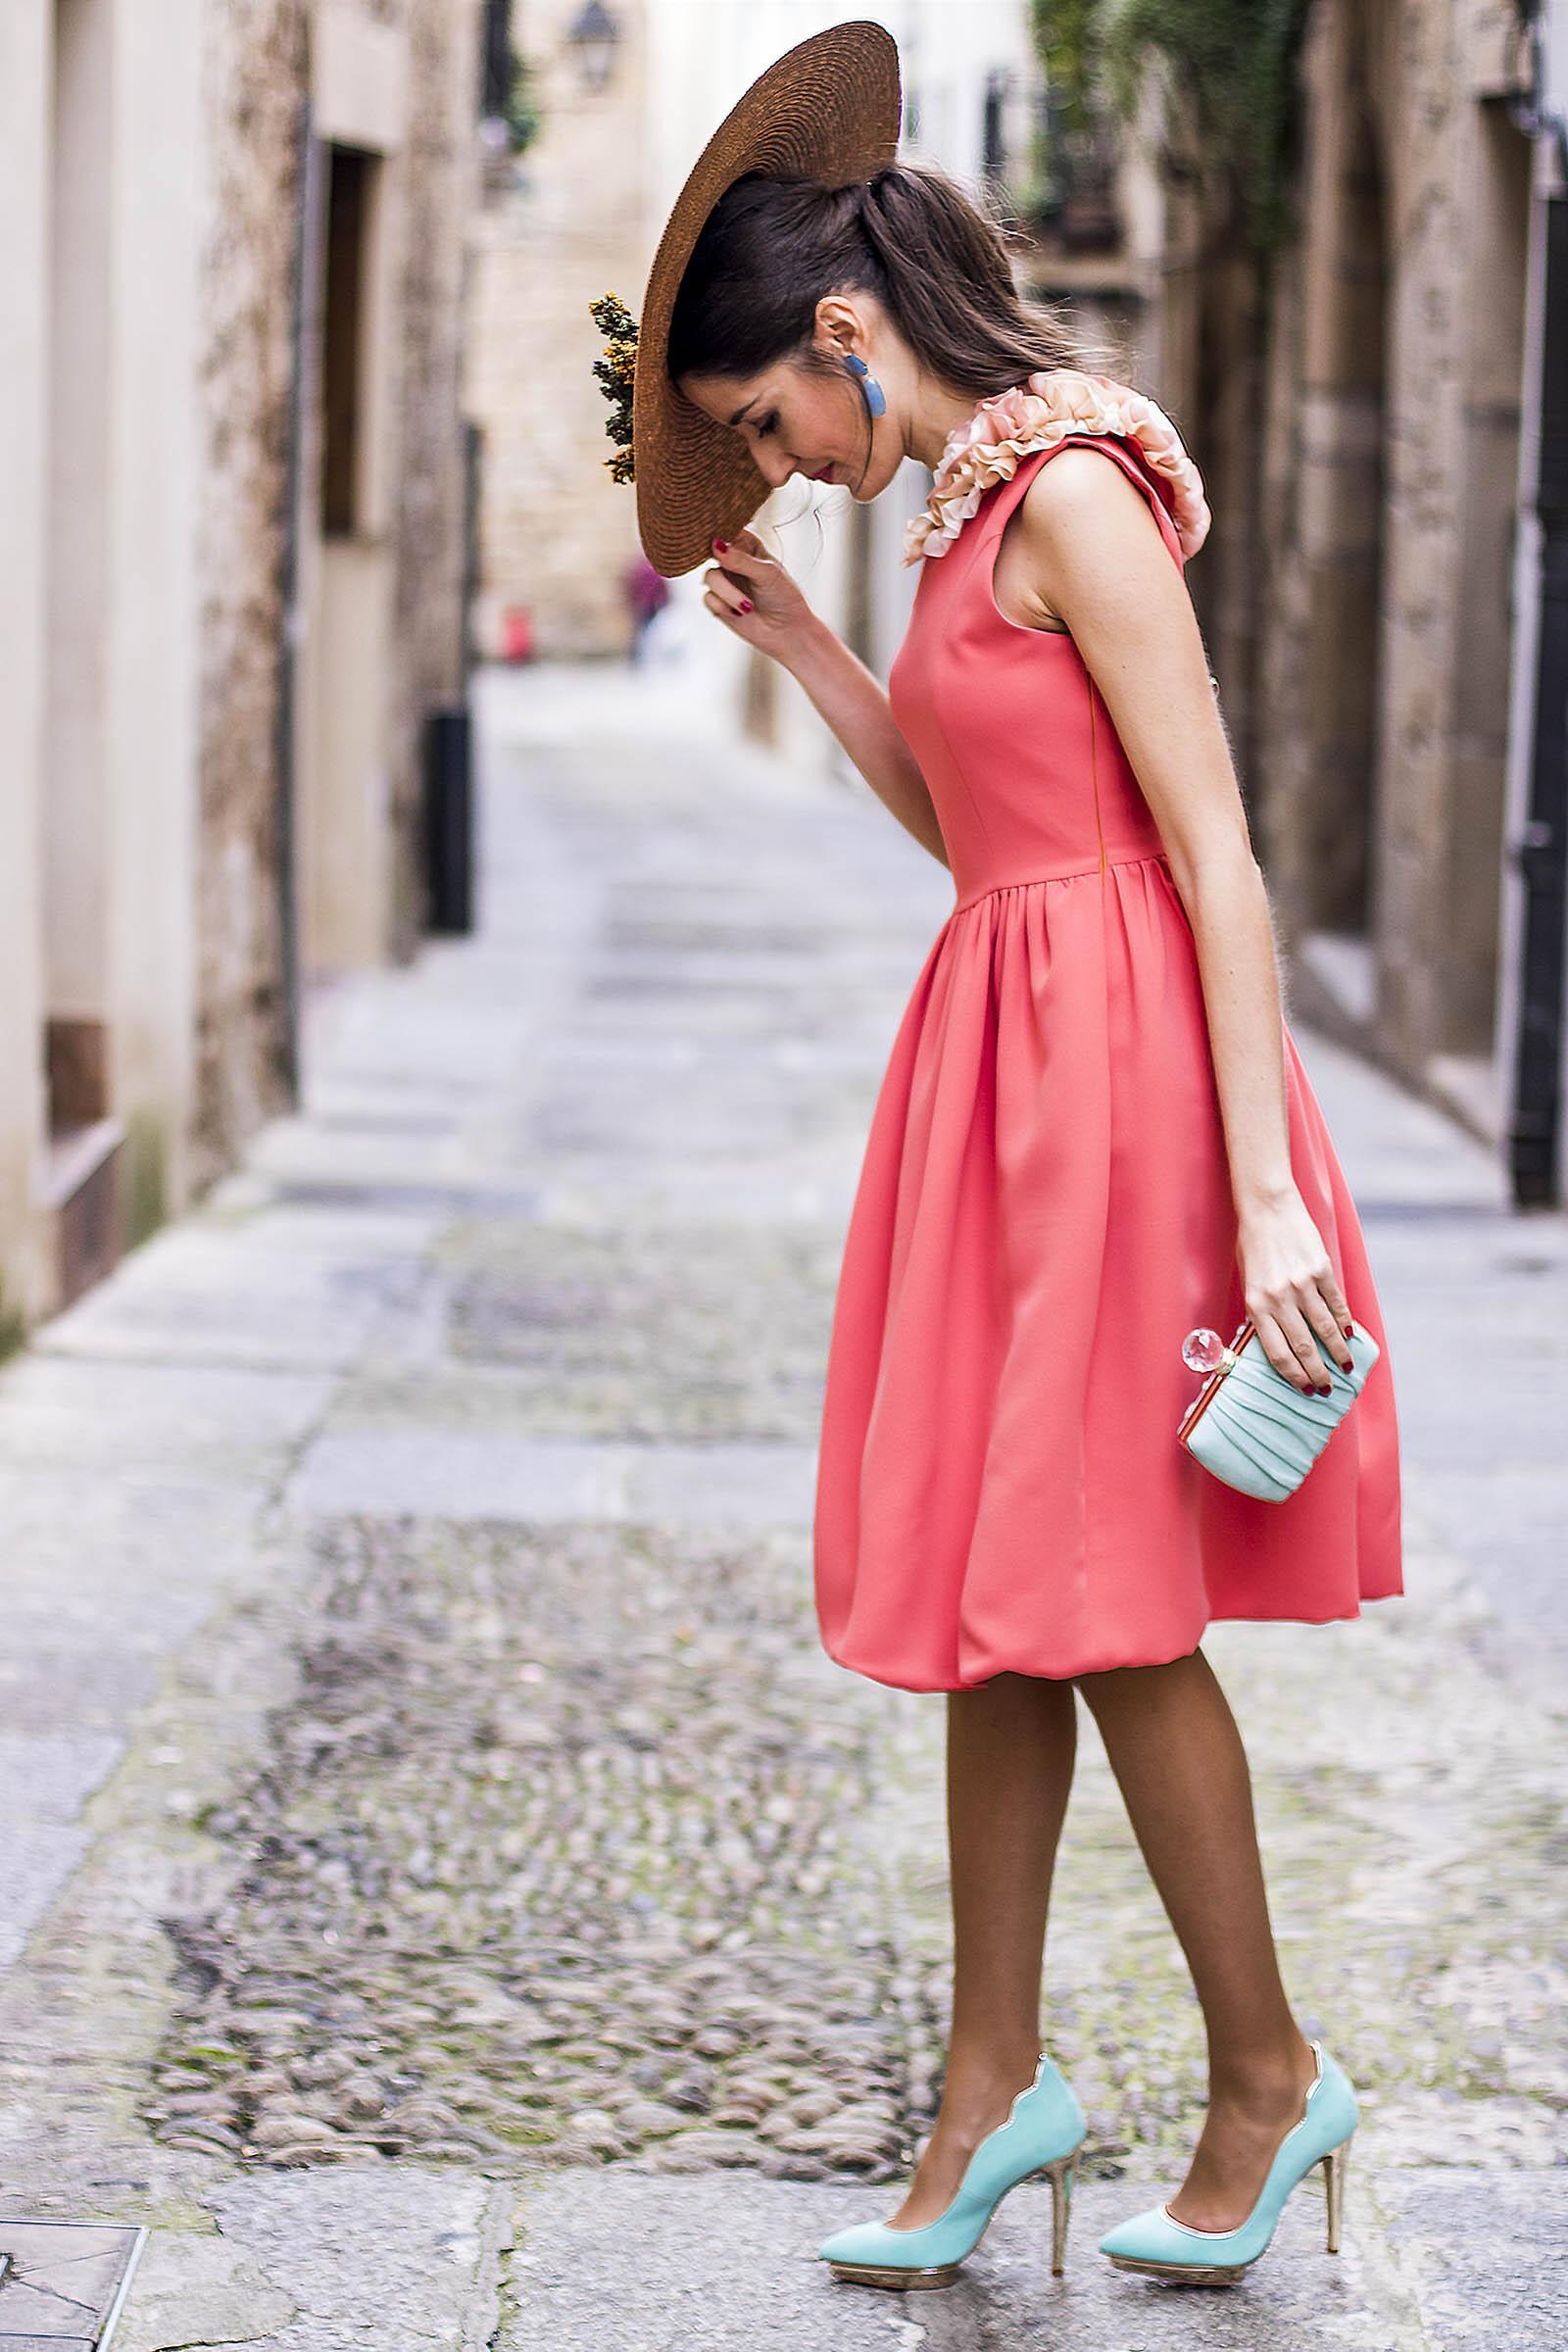 Vestido rosa complementos azul